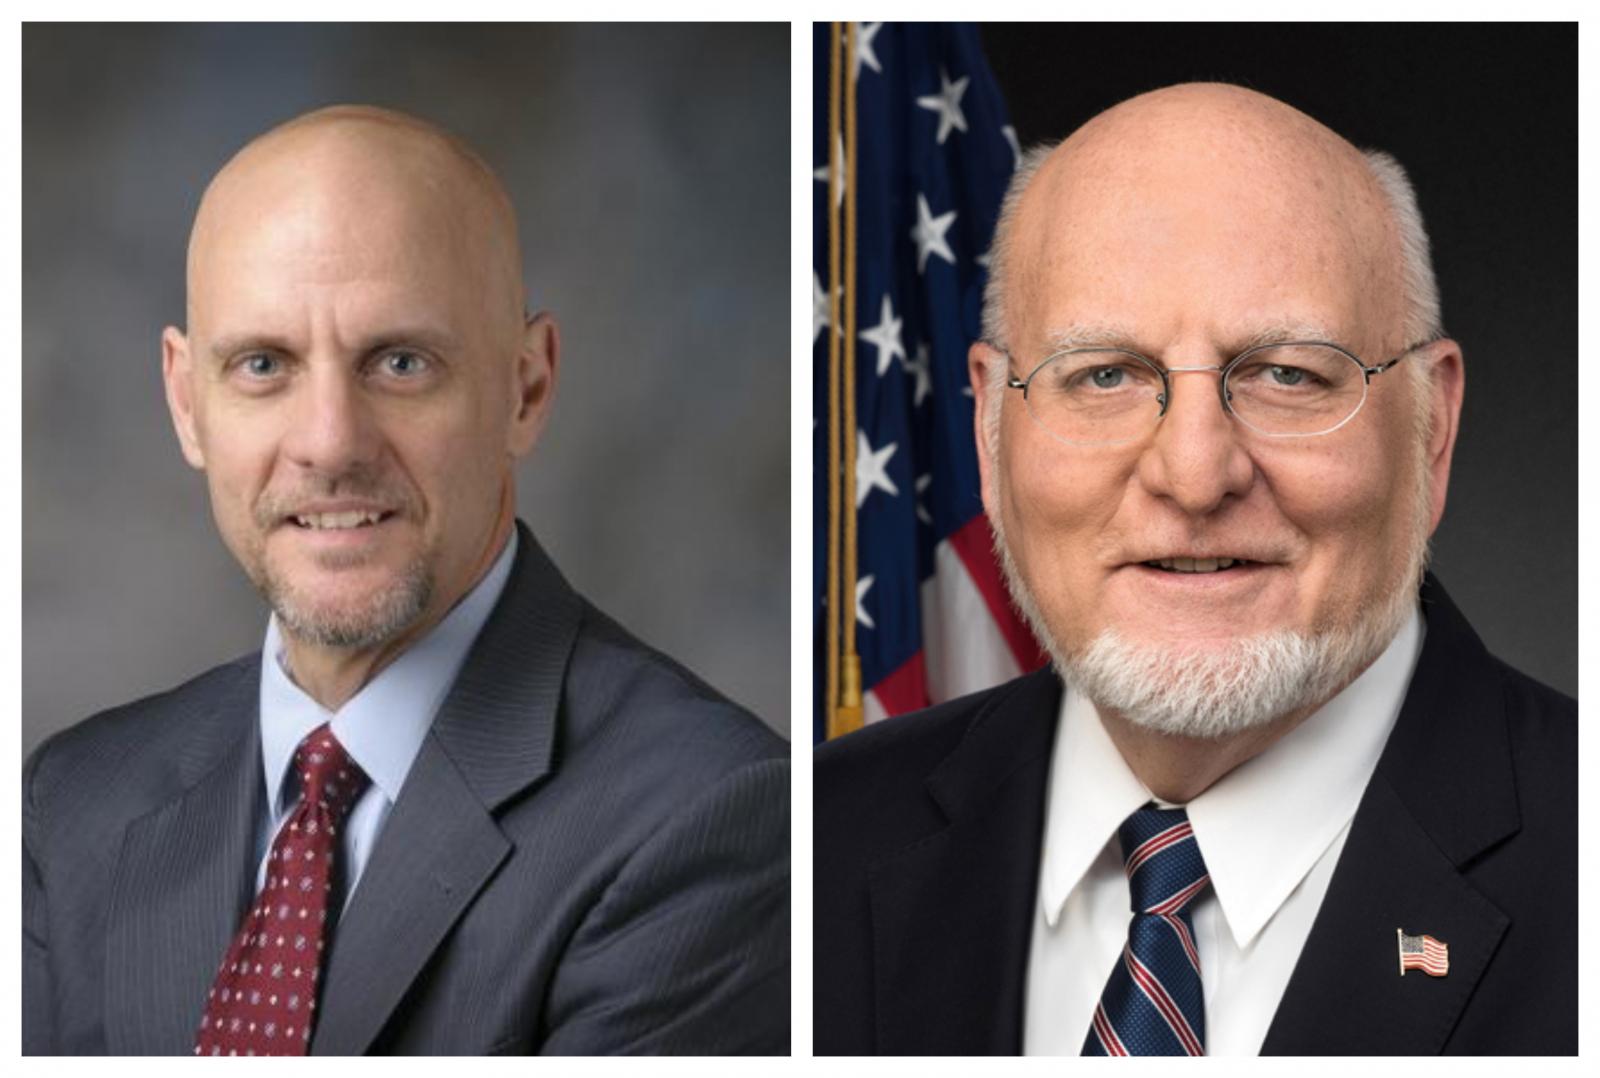 White House Top Health Officials In Self-Quarantine As Precaution